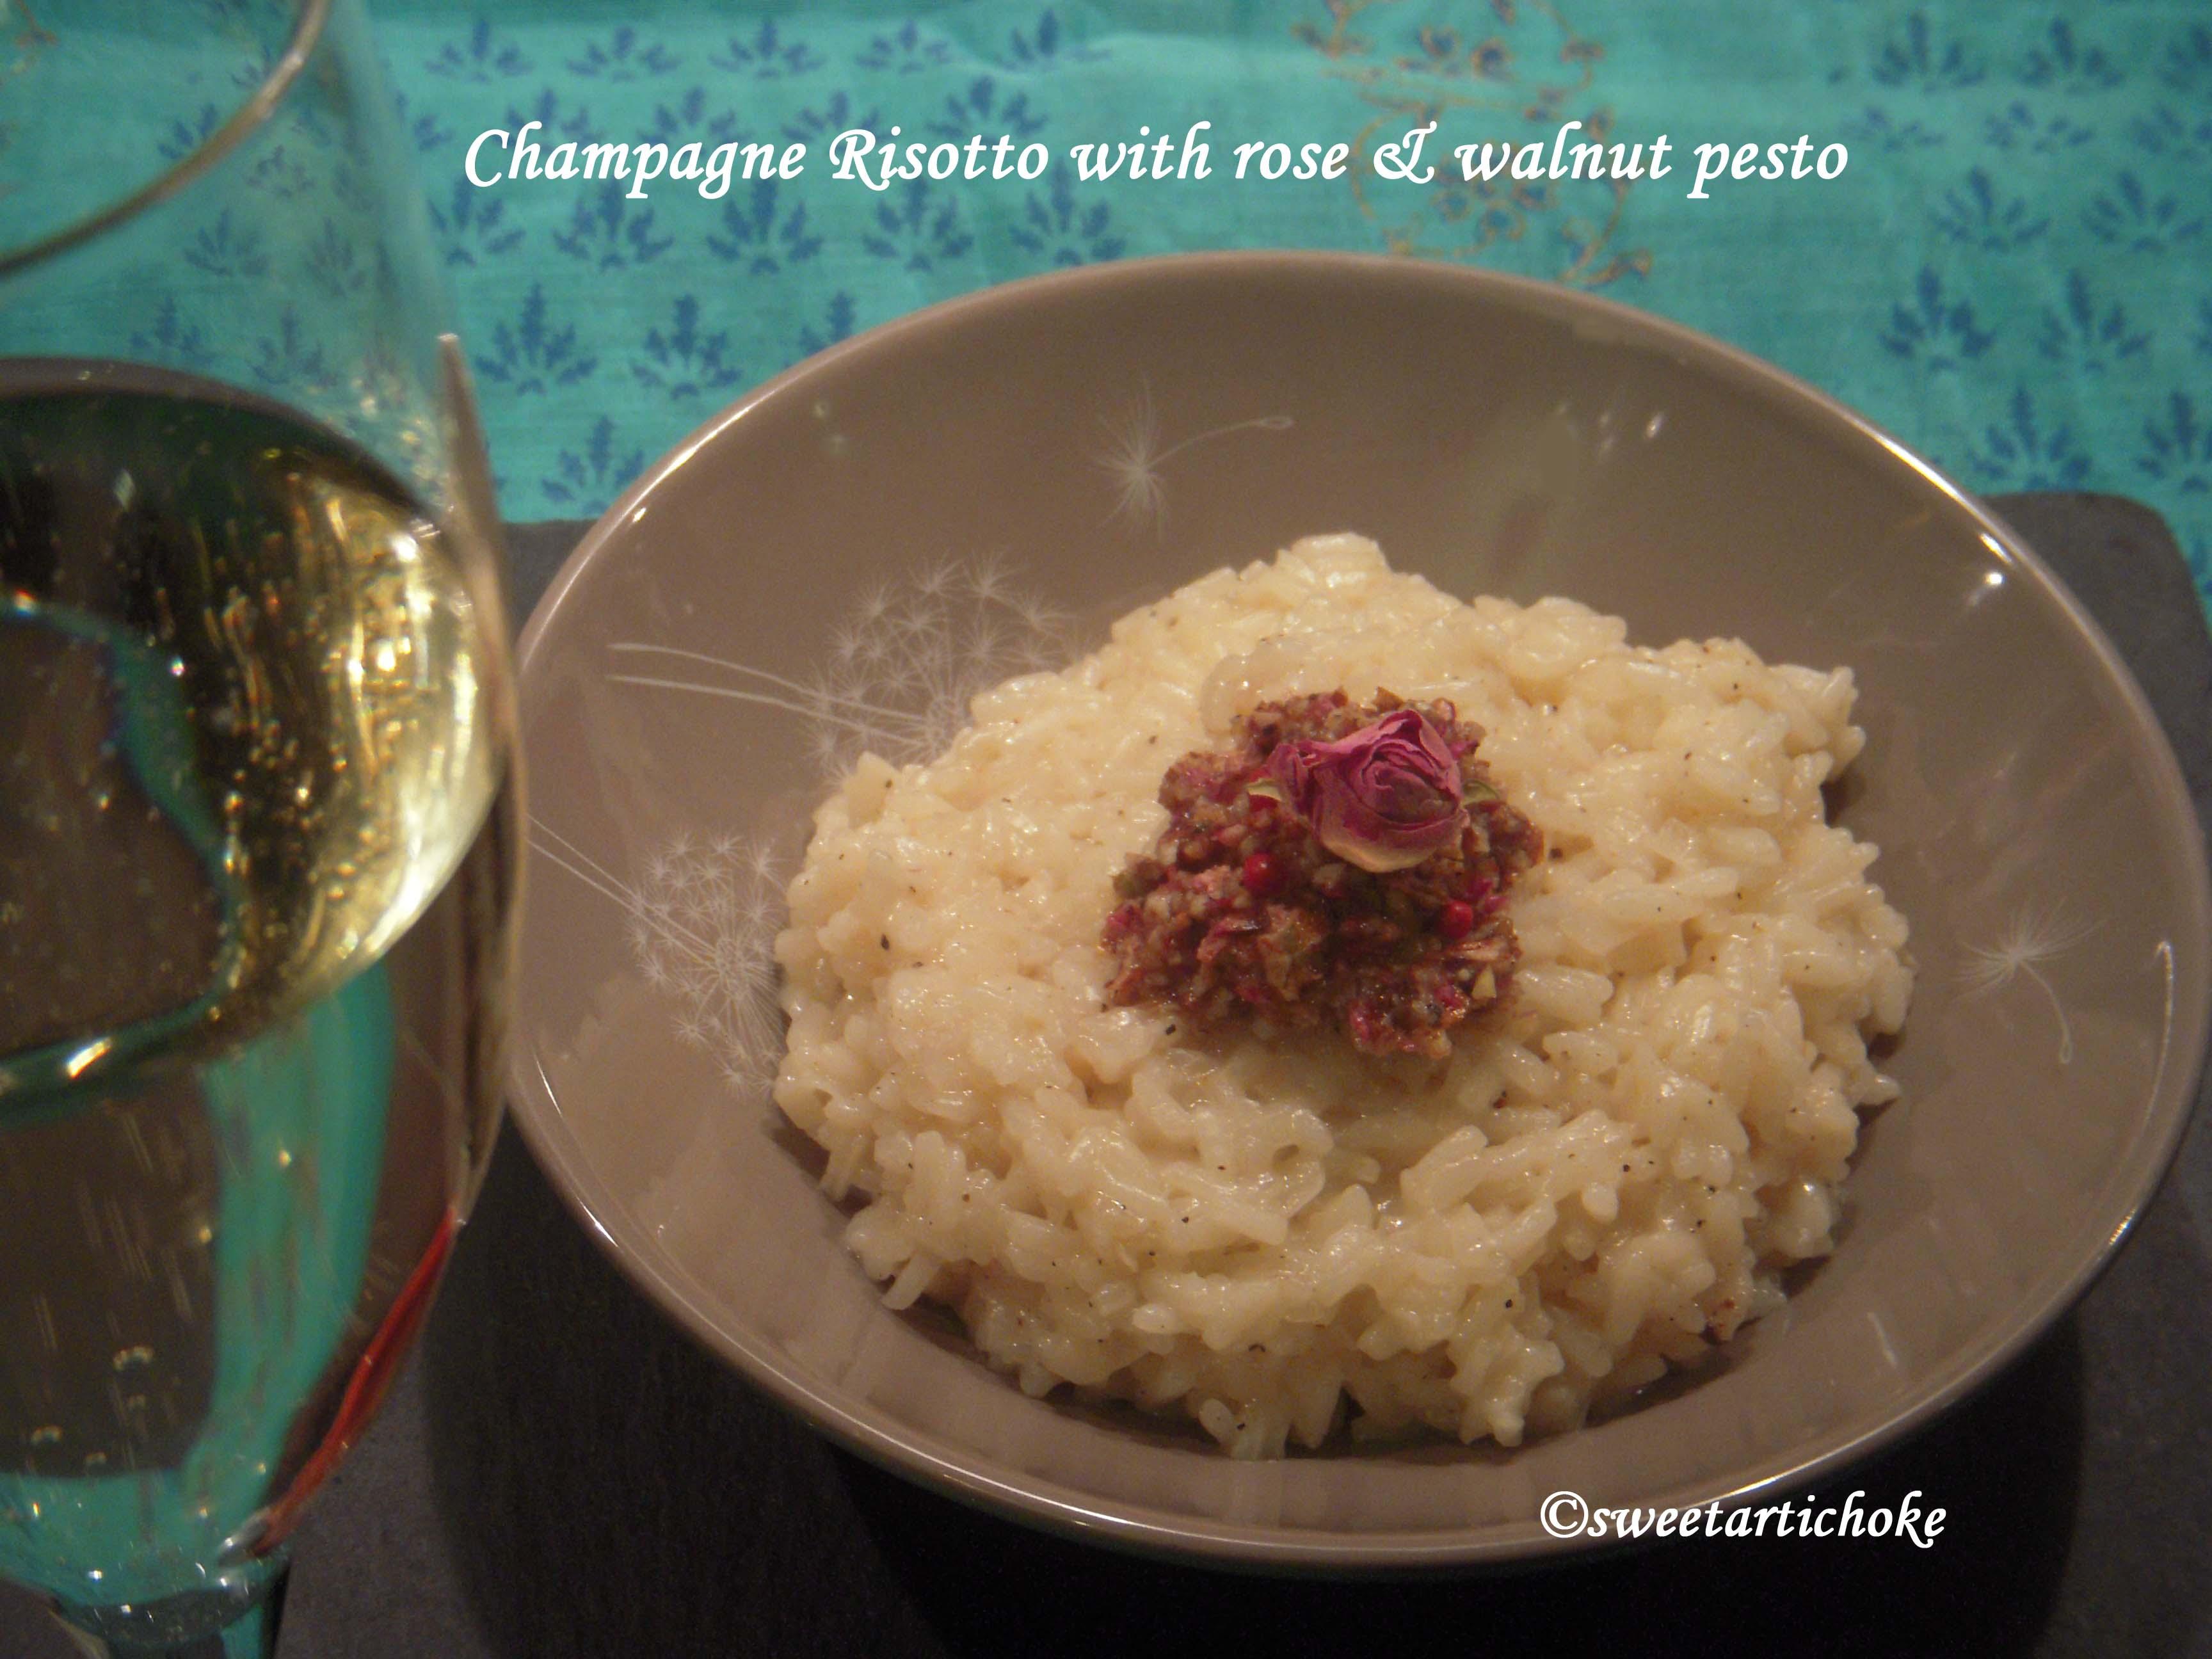 Champagne Risotto with rose & walnut pesto | Sweet artichoke